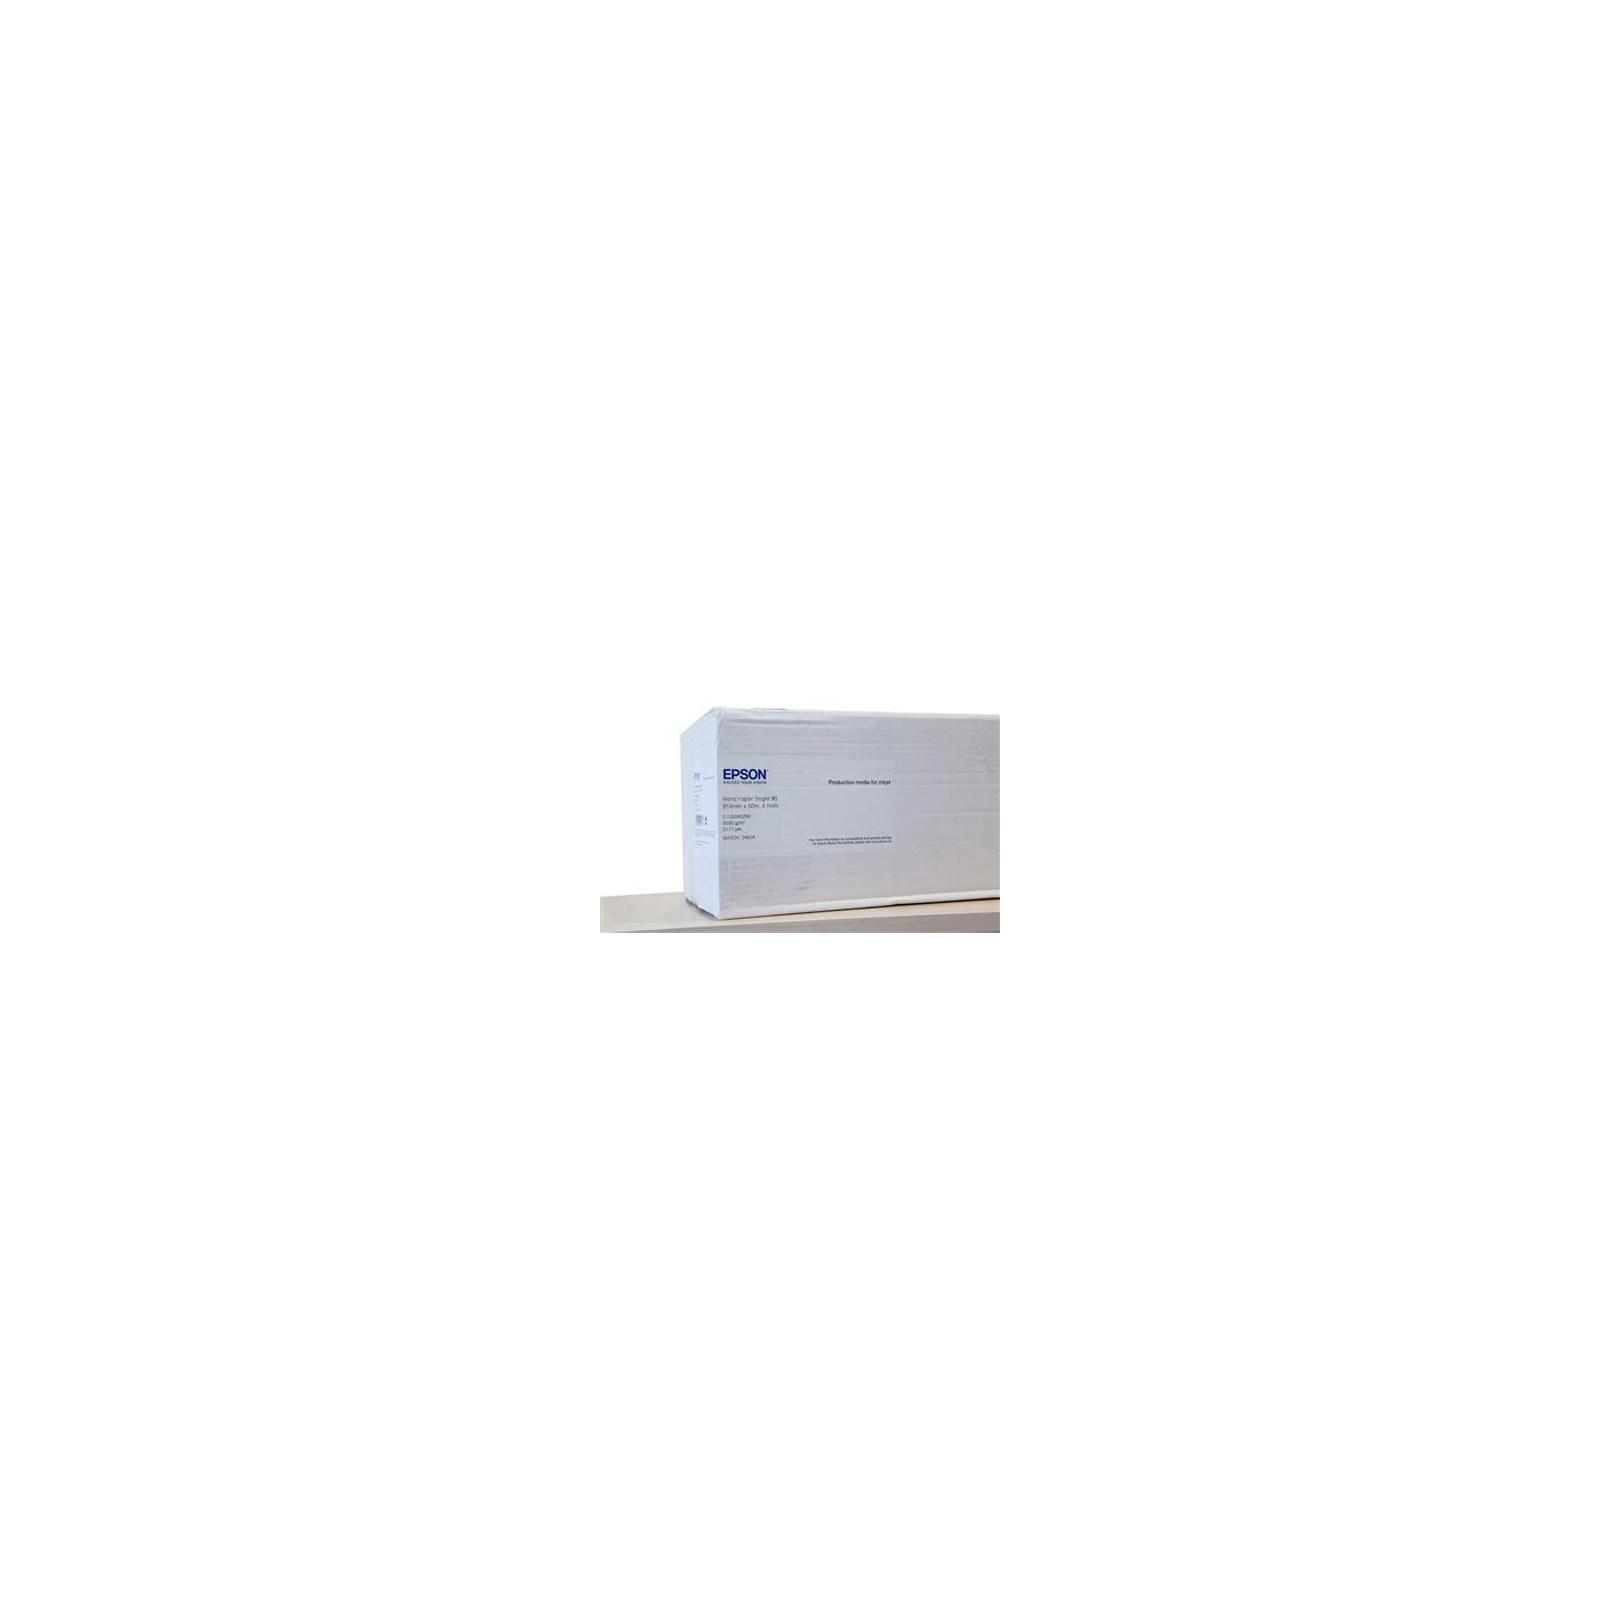 "Бумага EPSON 24"" Bond Paper Satin (C13S045282)"